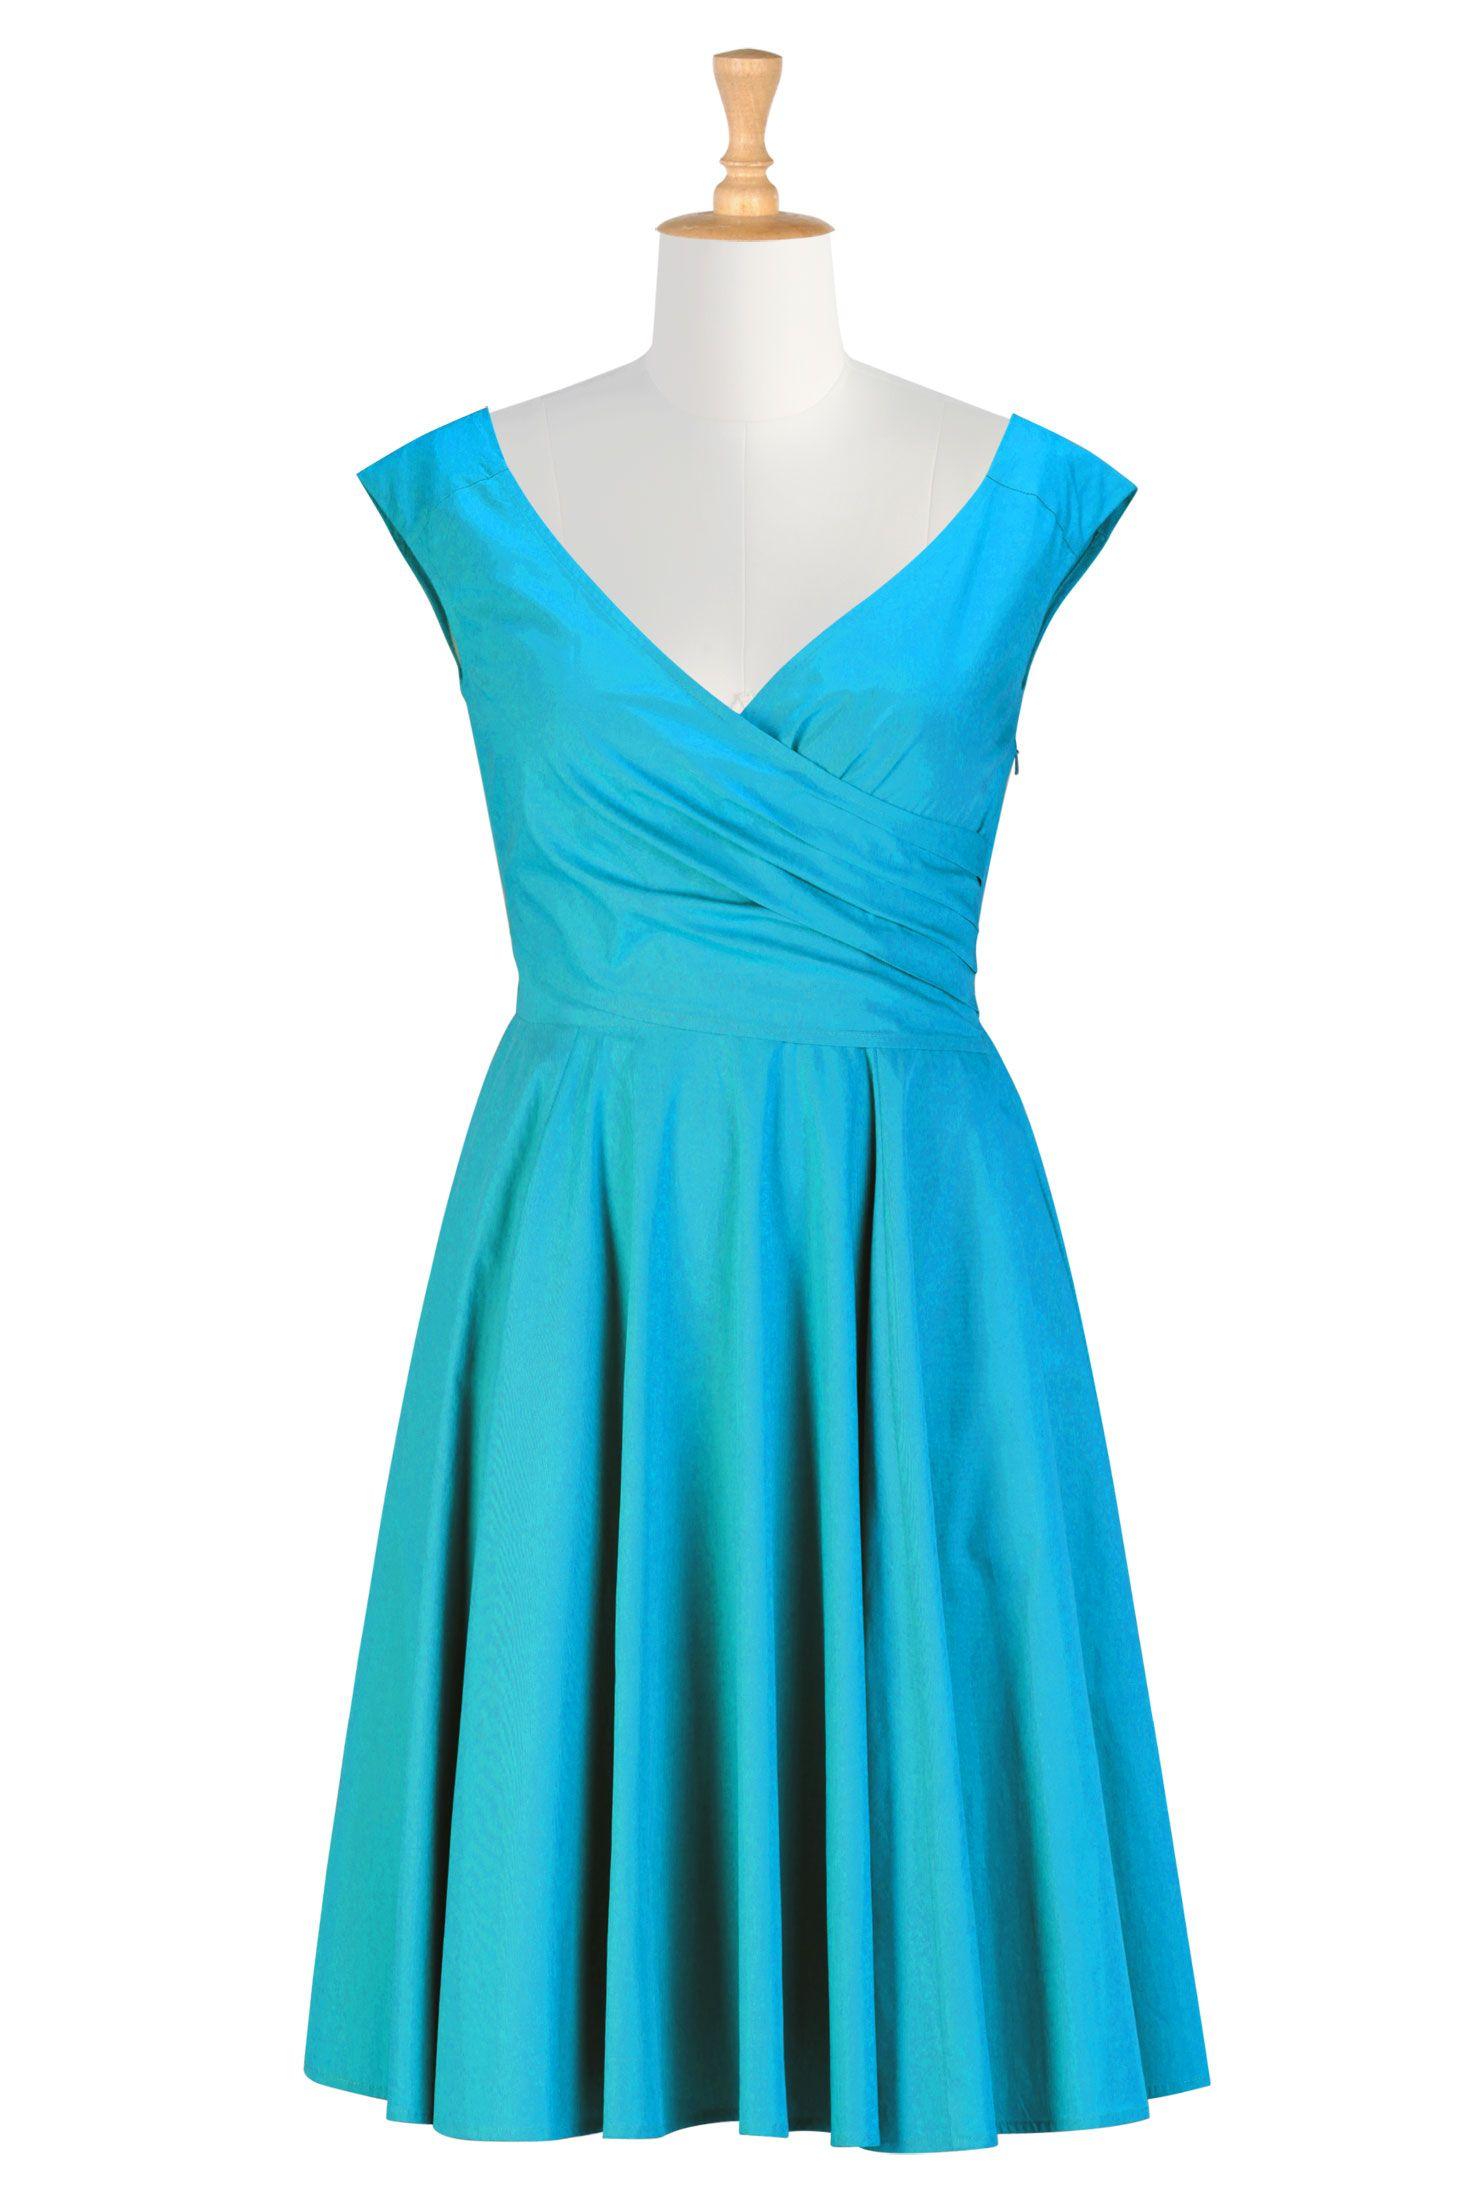 Savannah dress | Womens designer dresses, Petite women and Trendy ...